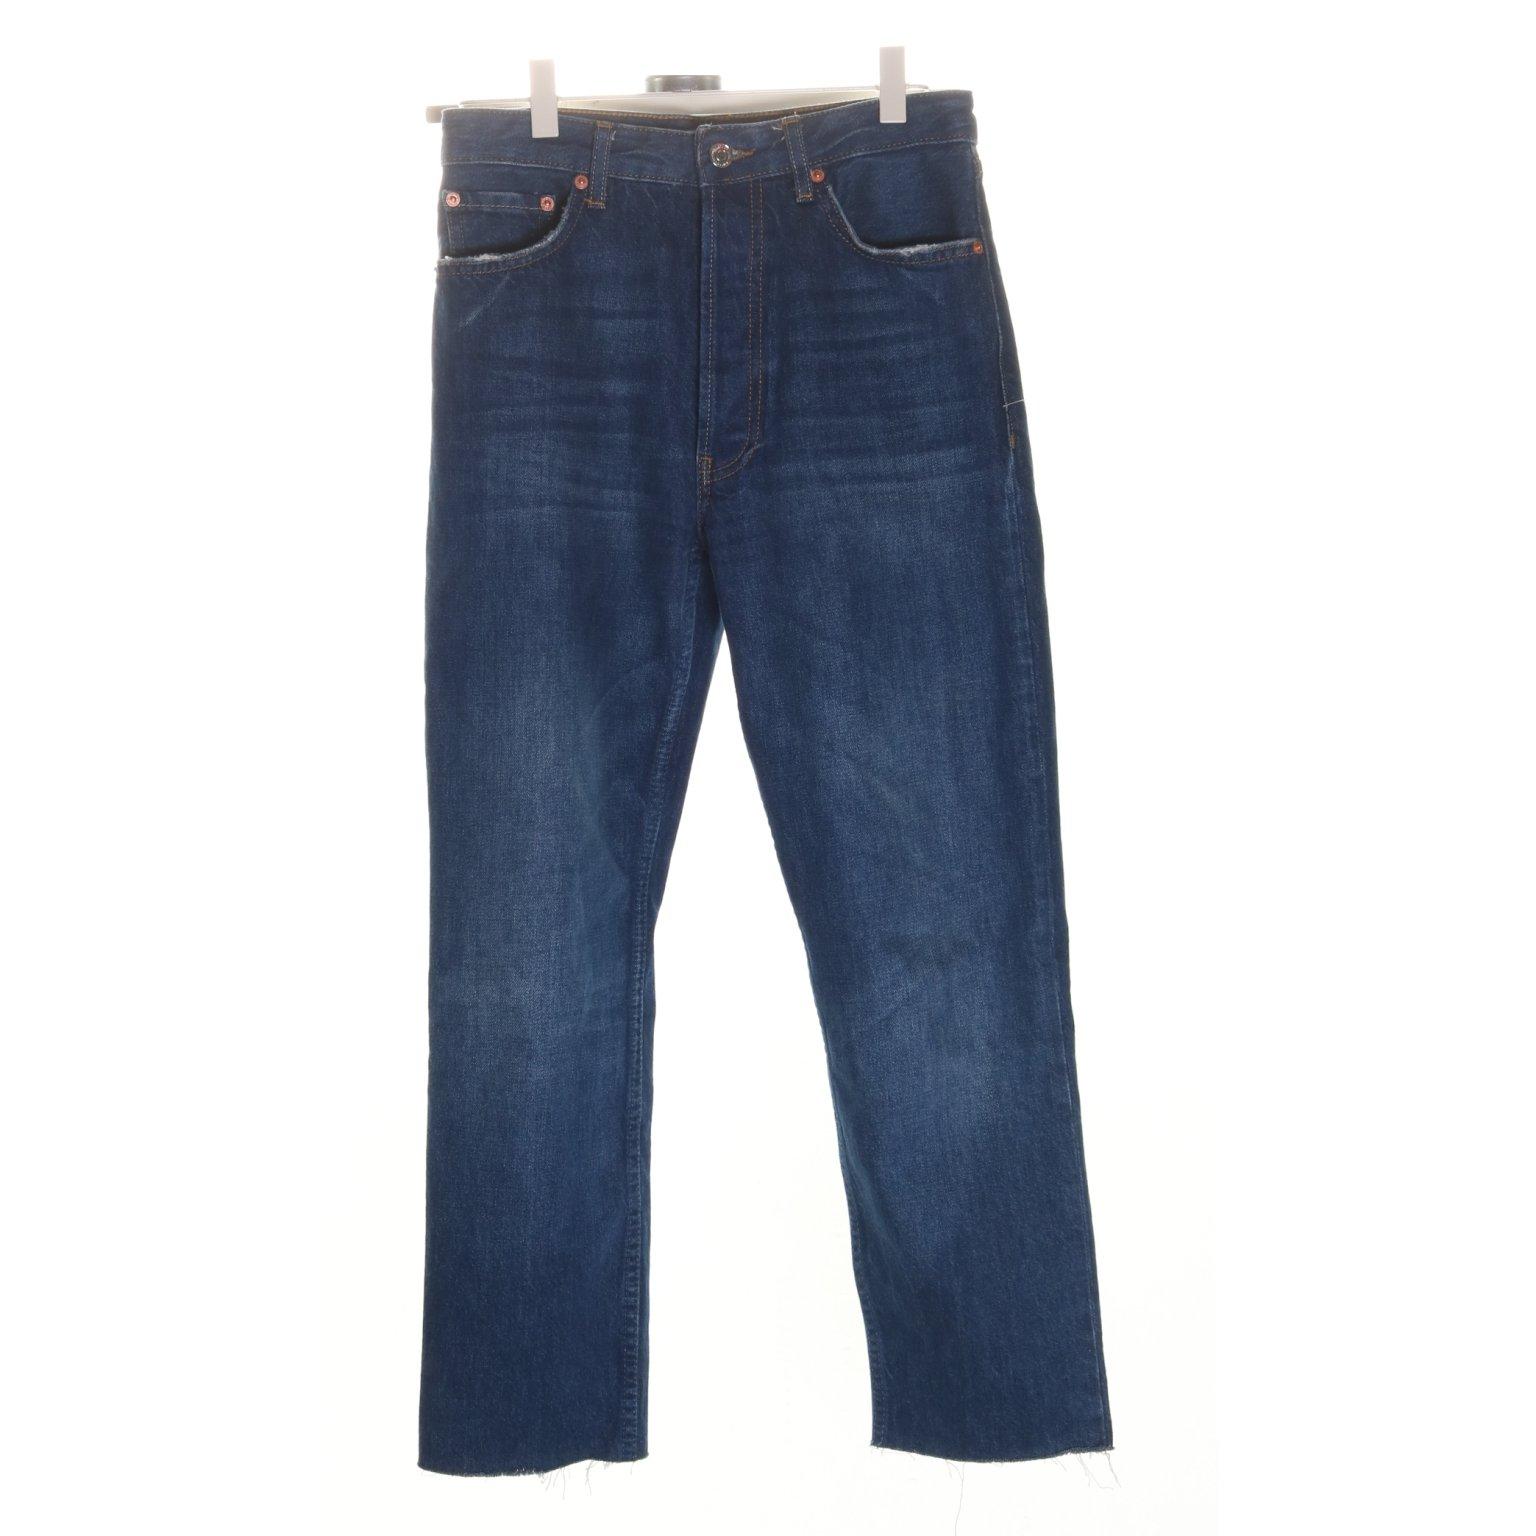 09f1de58136e Zara Woman, Jeans, Strl: Eur 34, Hög midj.. (353650199) ᐈ Sellpy på ...